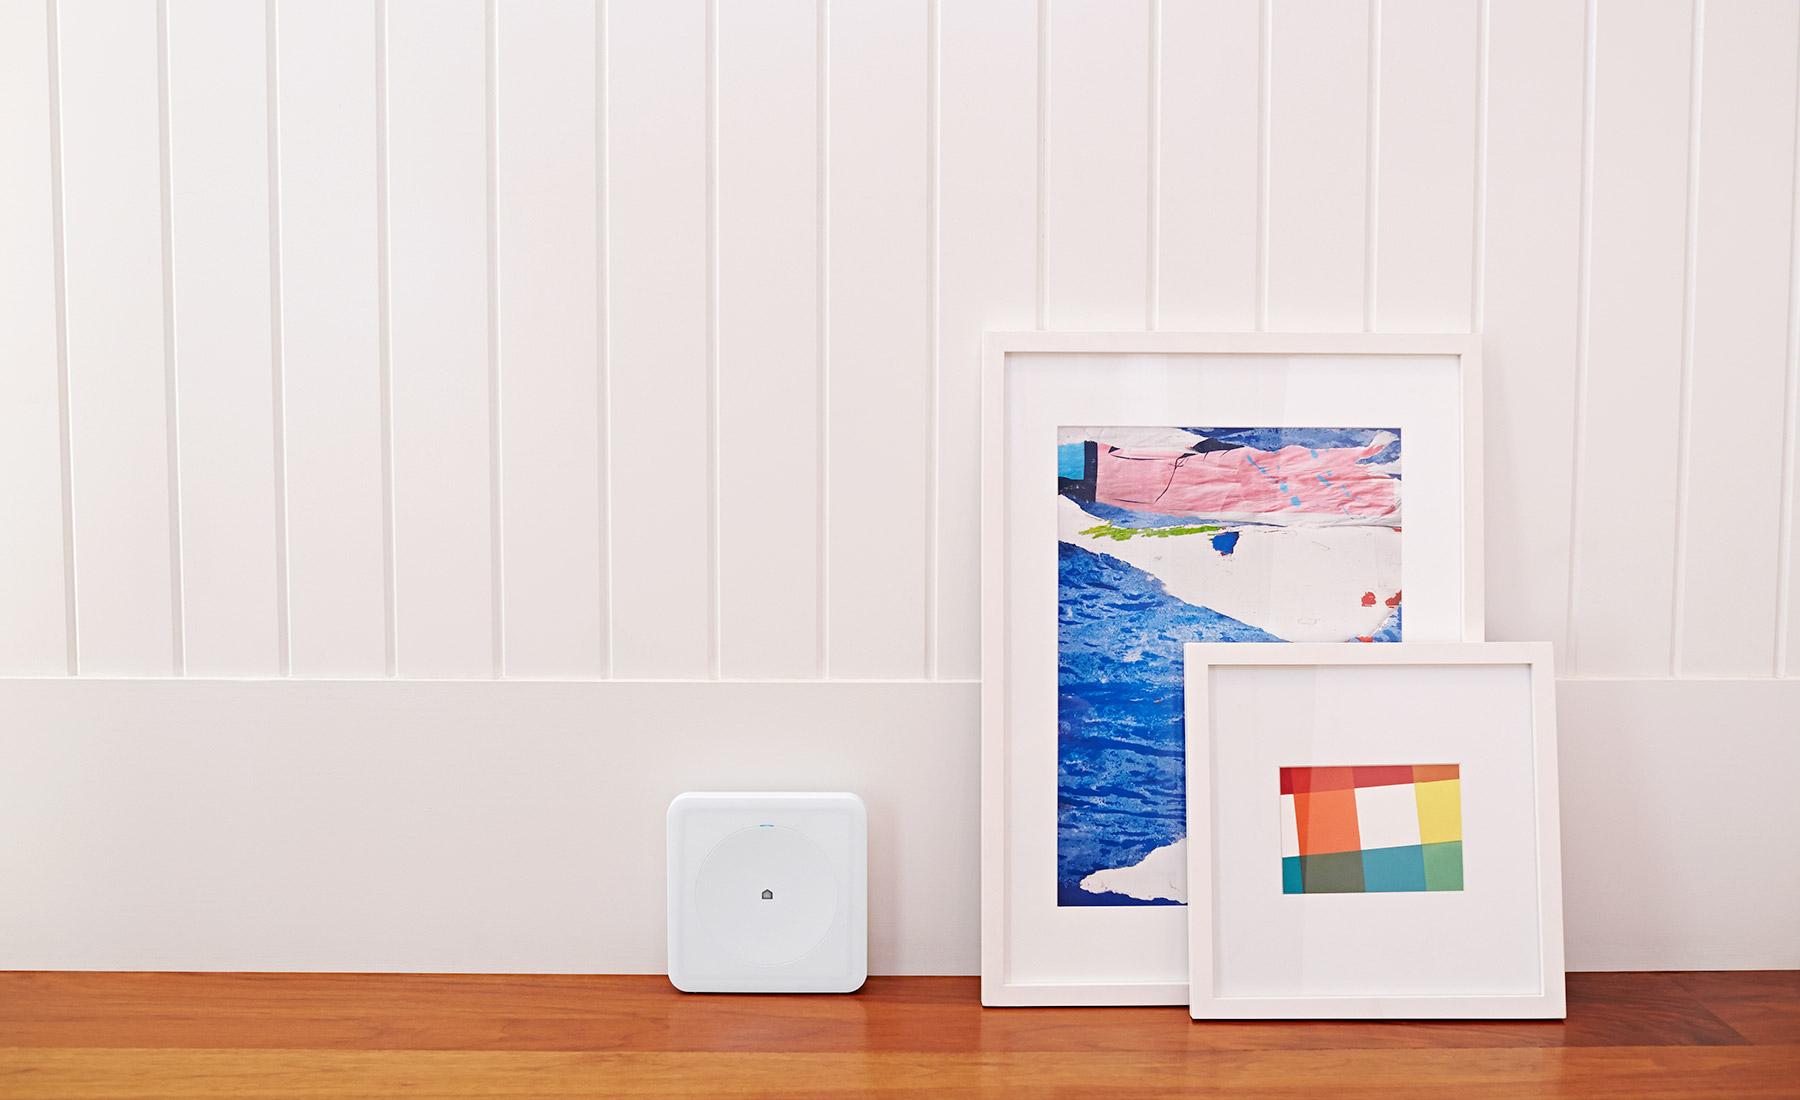 Wink Model PWHUBWH18 Smart Home Hub